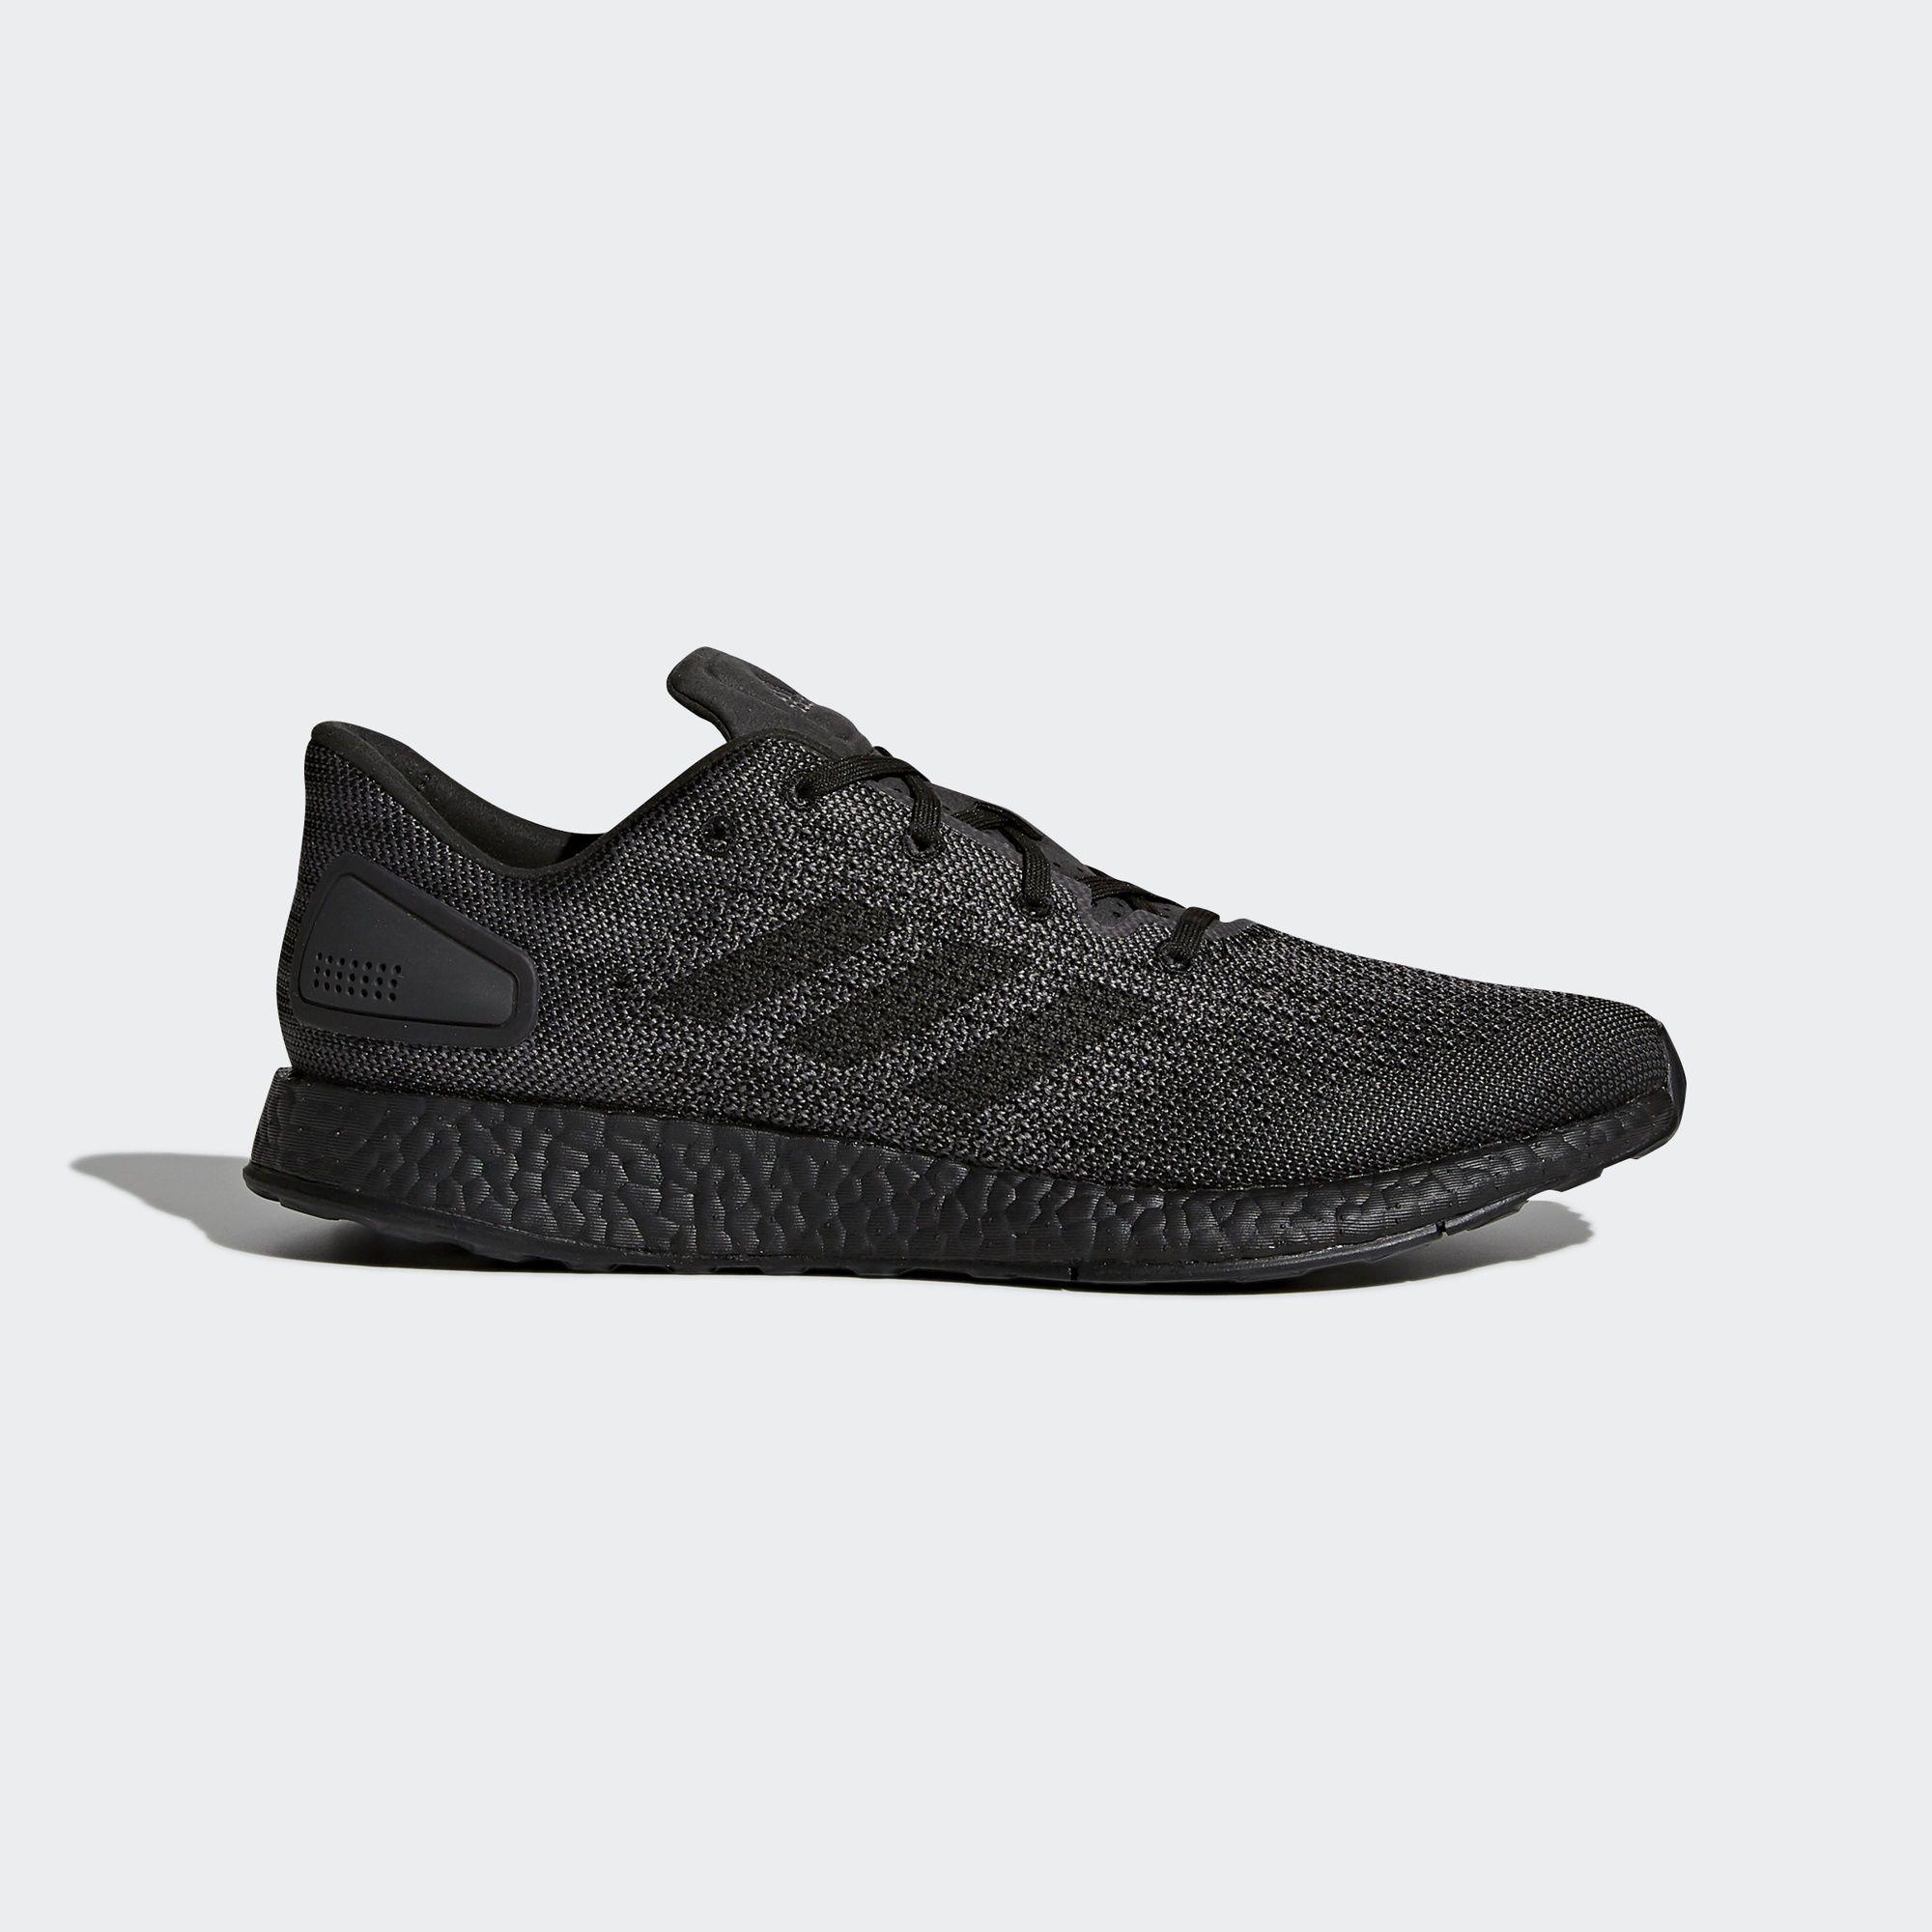 best price todas negro adidas tennis zapatos 460f4 4332d